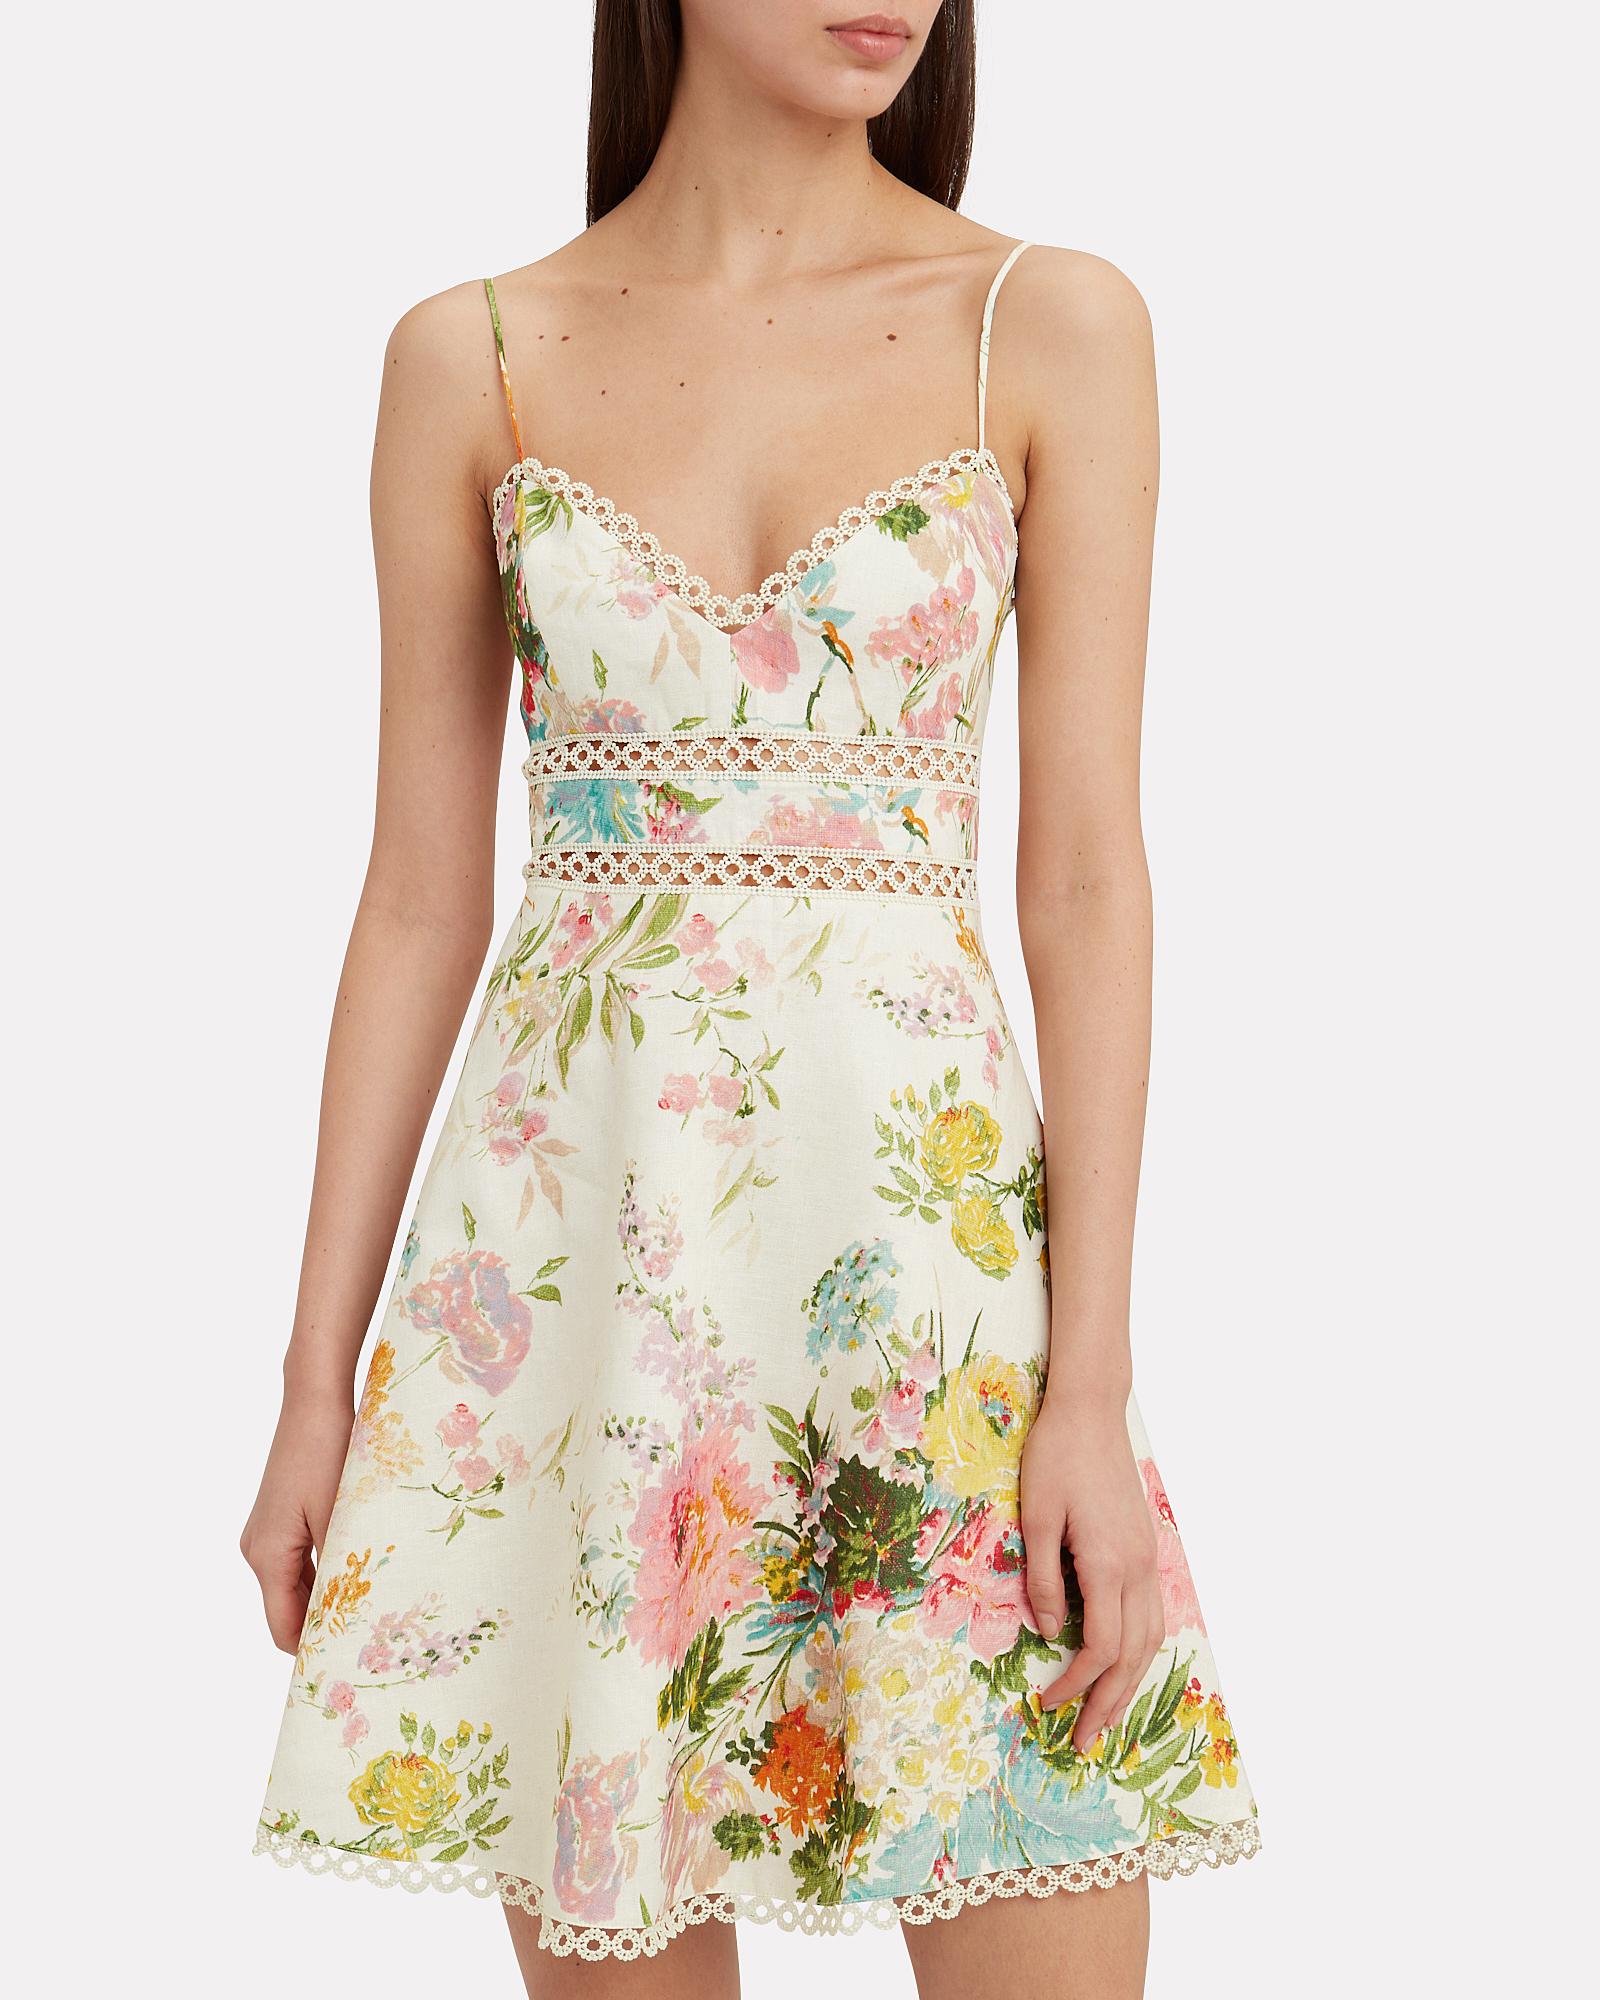 2f140c7552c36 ... Heathers Garden Floral Dress, MULTI, hi-res ...